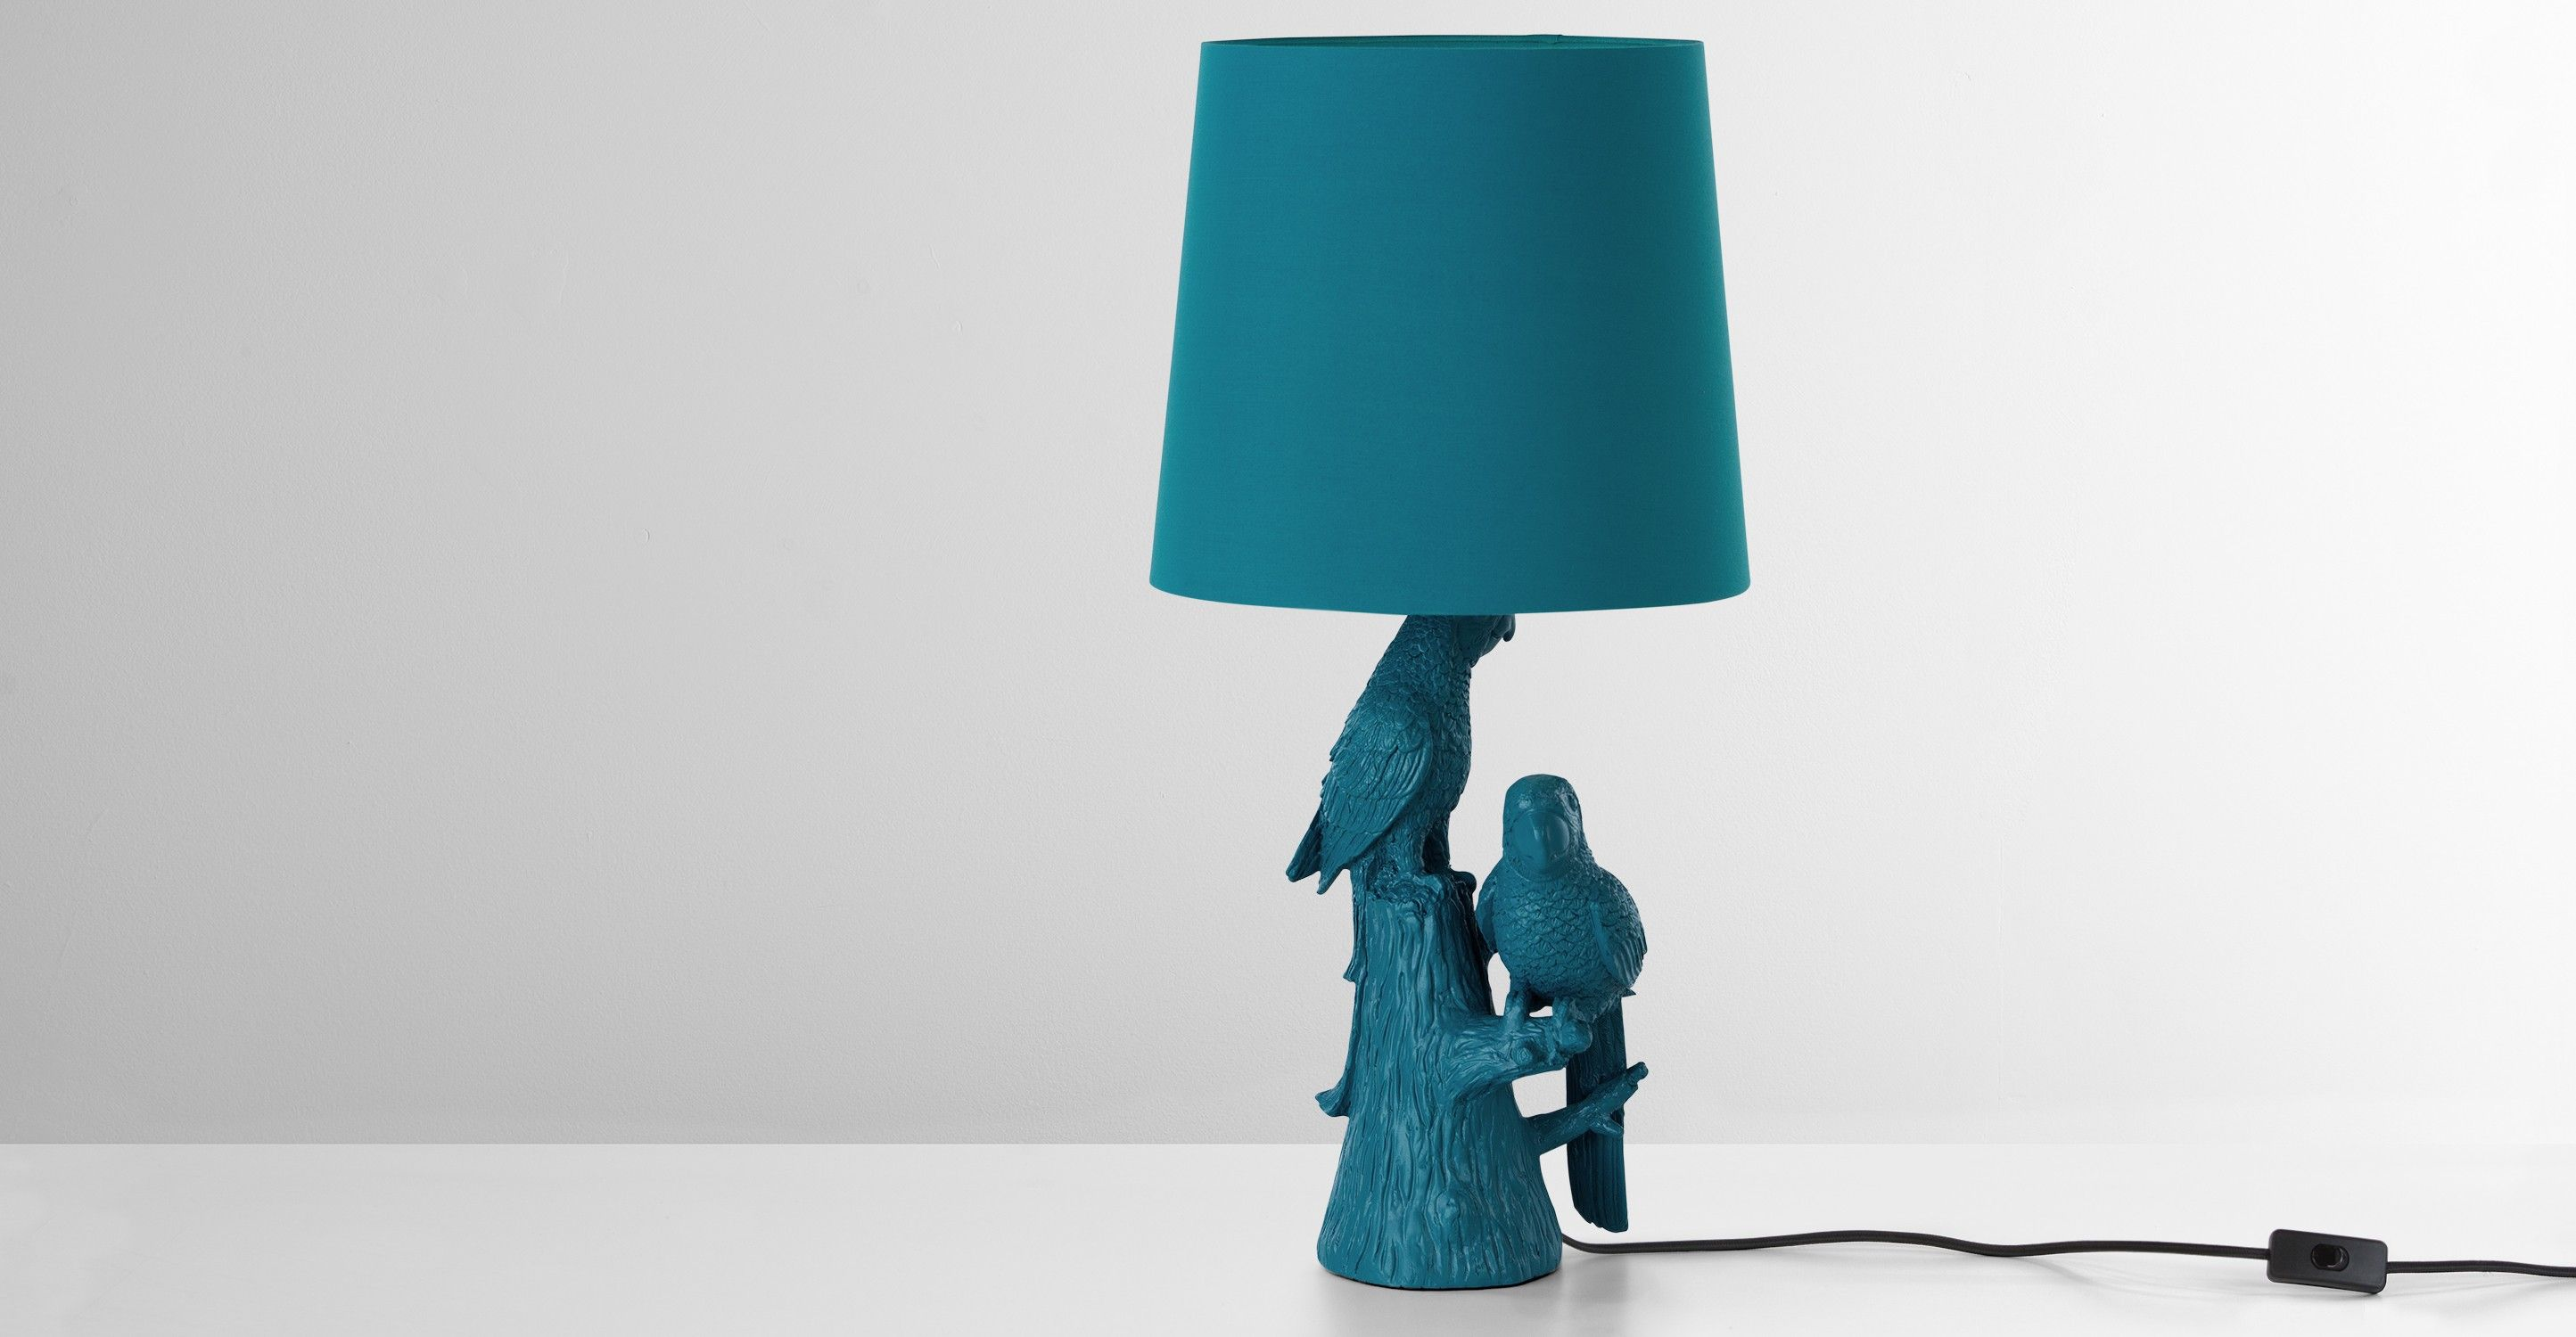 Parrot lampe de table bleu canard